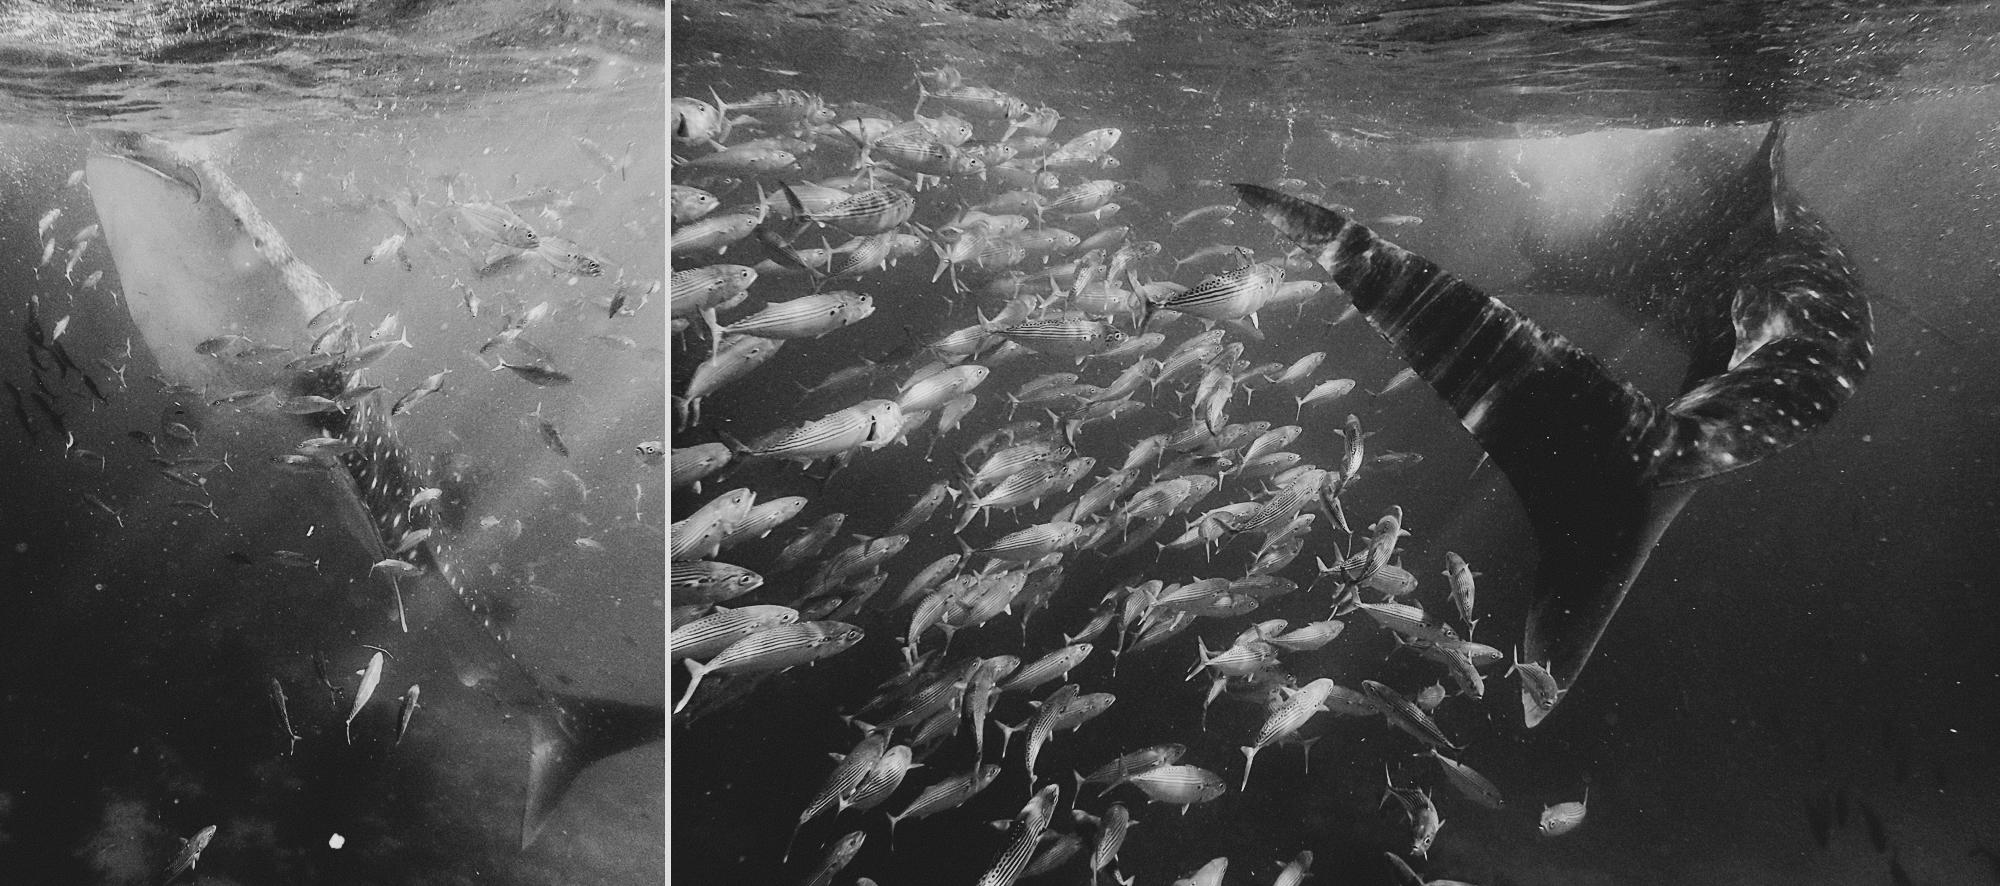 Underwater photography @AnneClaireBrun.com